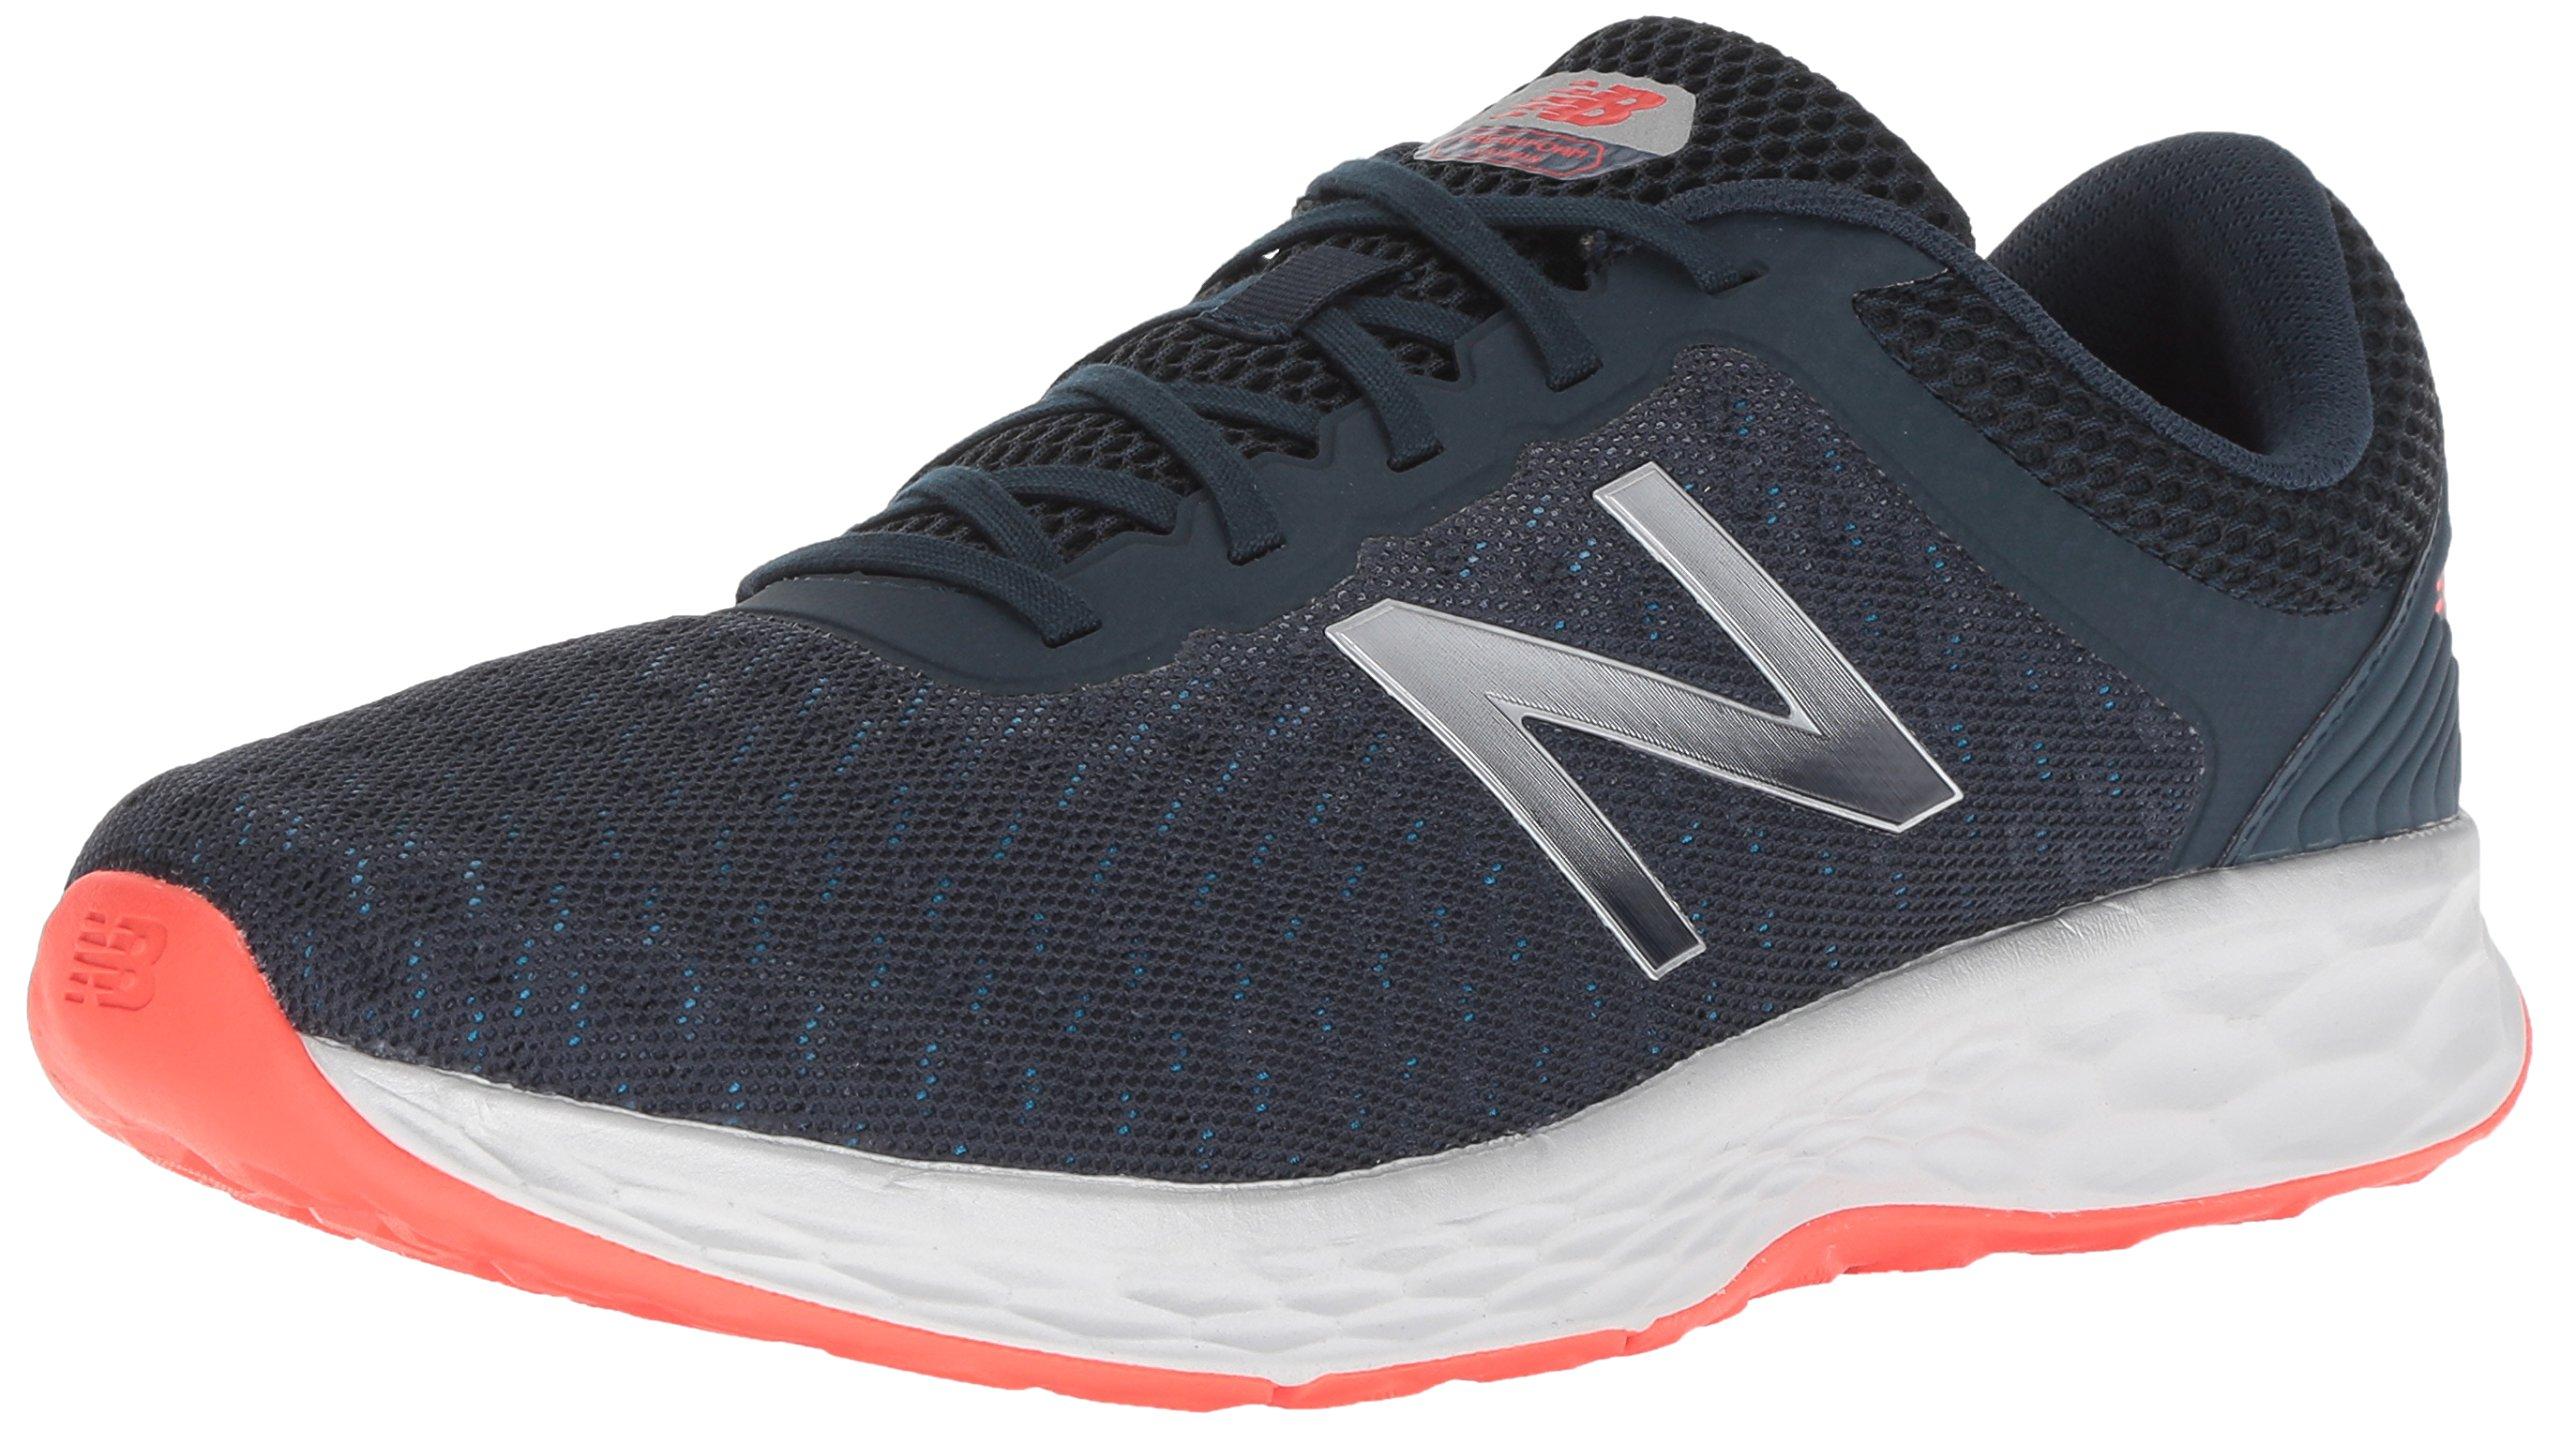 New Balance Men's Kaymin V1 Fresh Foam Running Shoe Galaxy 7 D US by New Balance (Image #1)